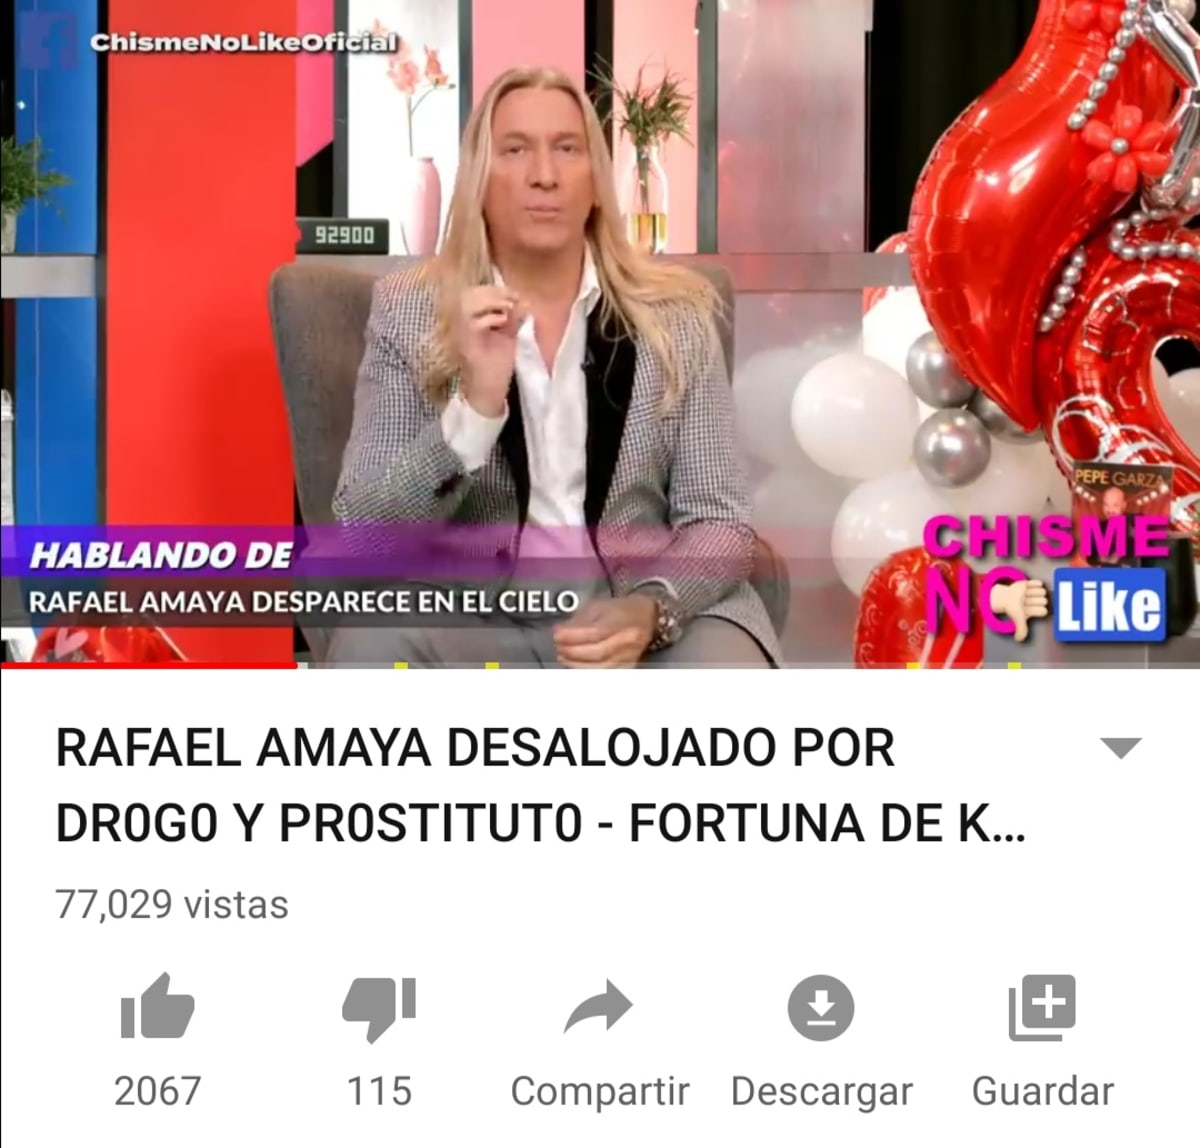 Rafael Amaya desaparecido